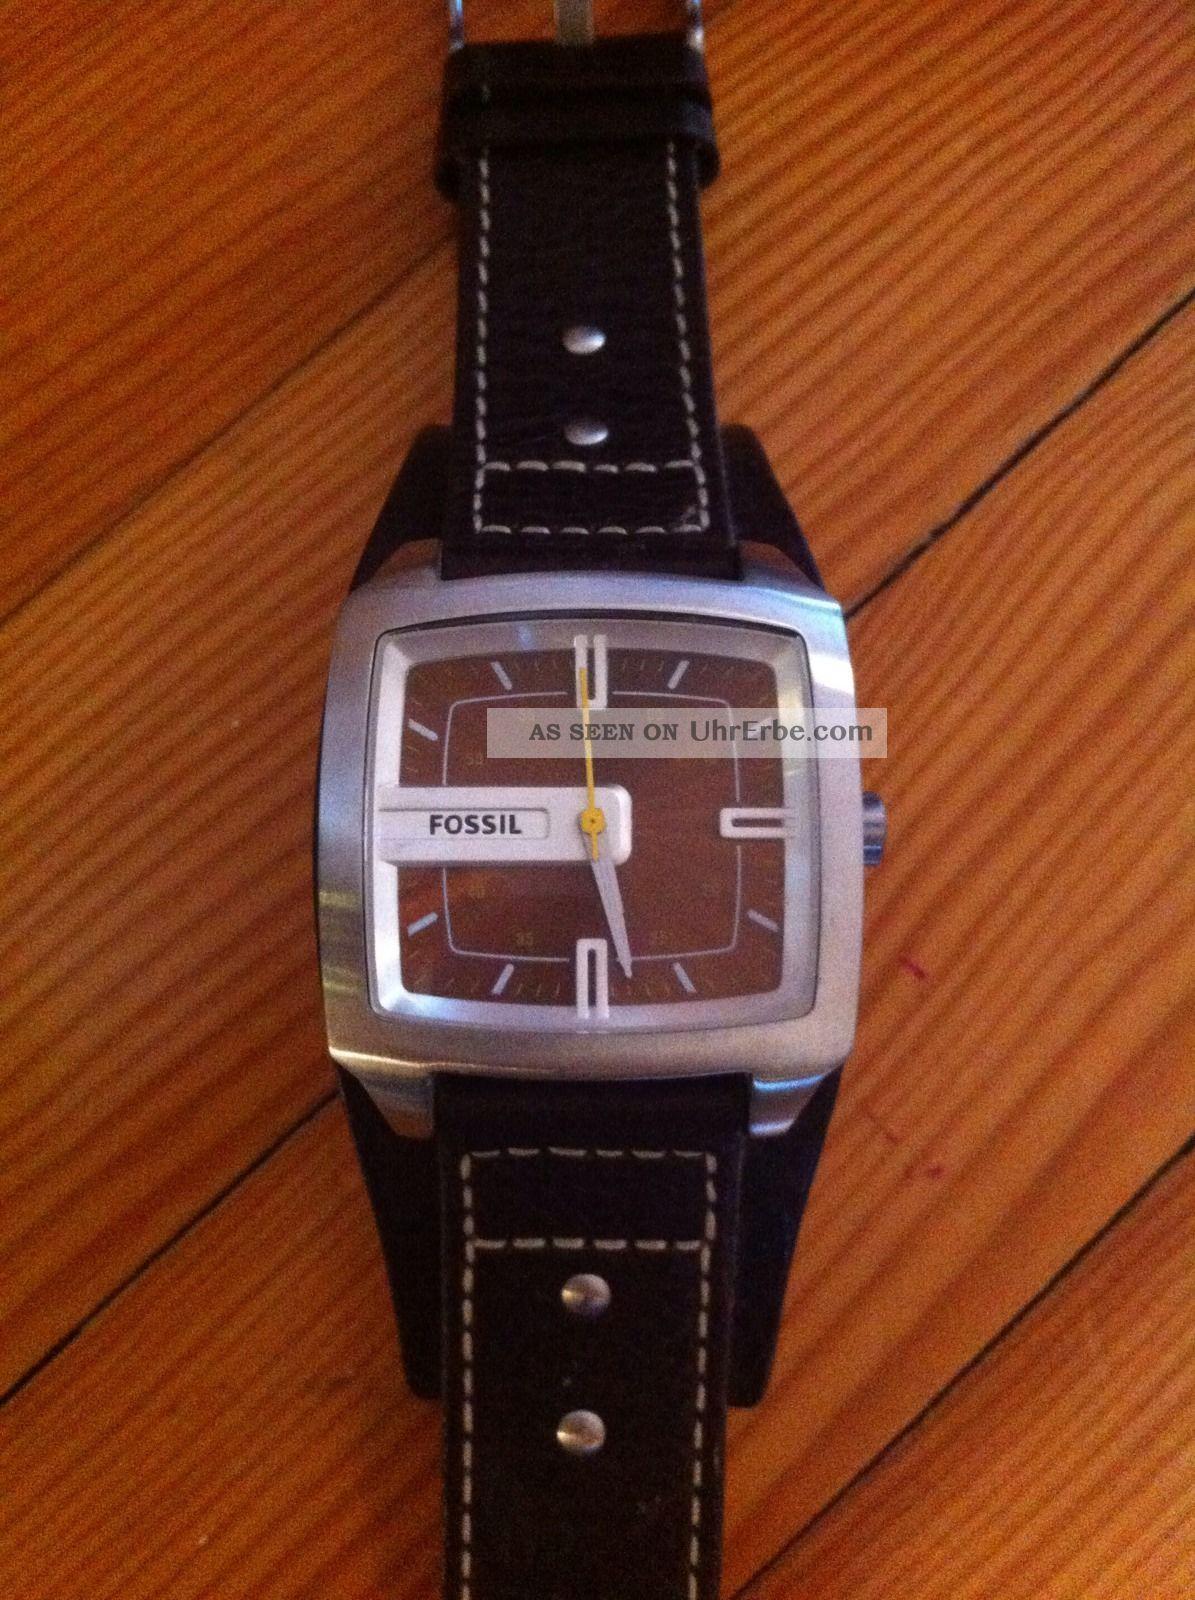 Fossil Herren Armbanduhr Braun Jr 9990 Armbanduhren Bild